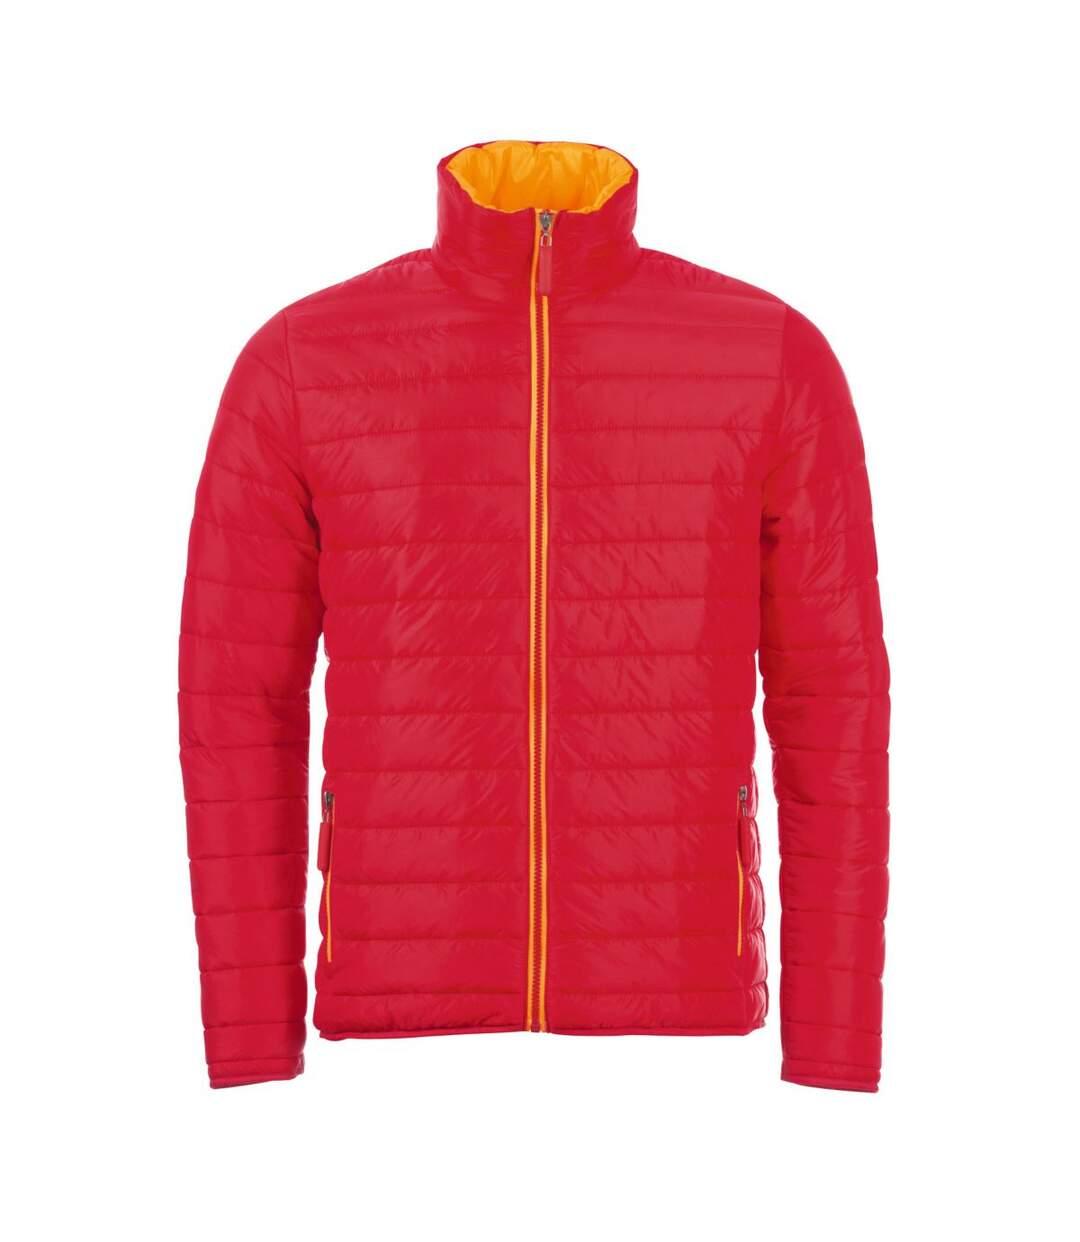 SOLS Mens Ride Padded Water Repellent Jacket (Red) - UTPC2168